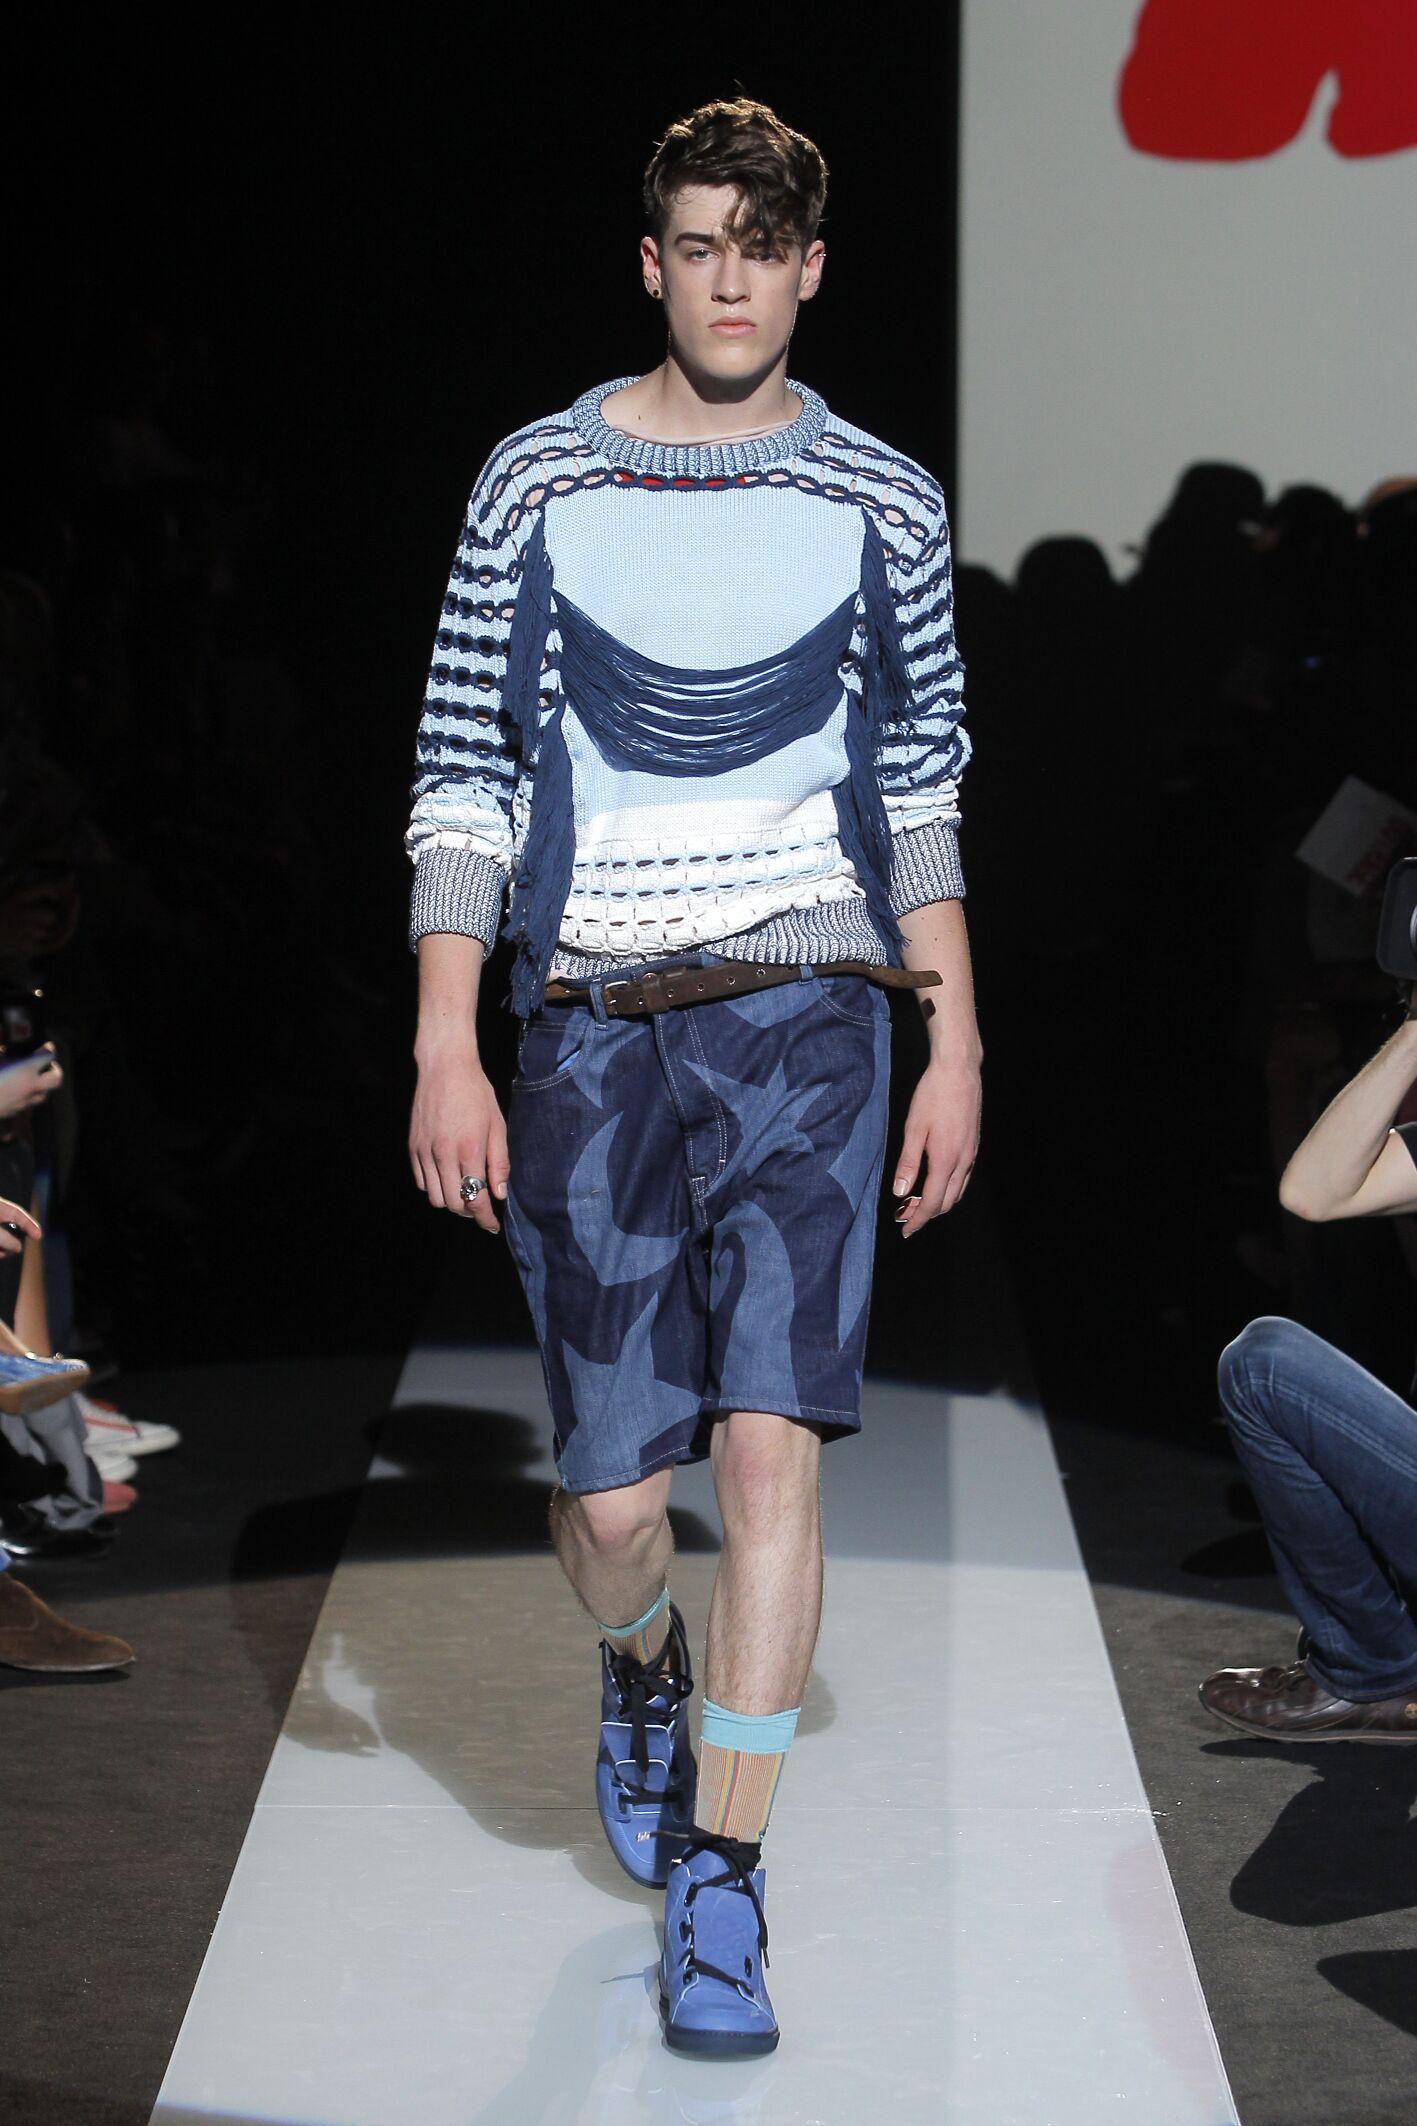 Vivienne Westwood Spring 2015 Catwalk